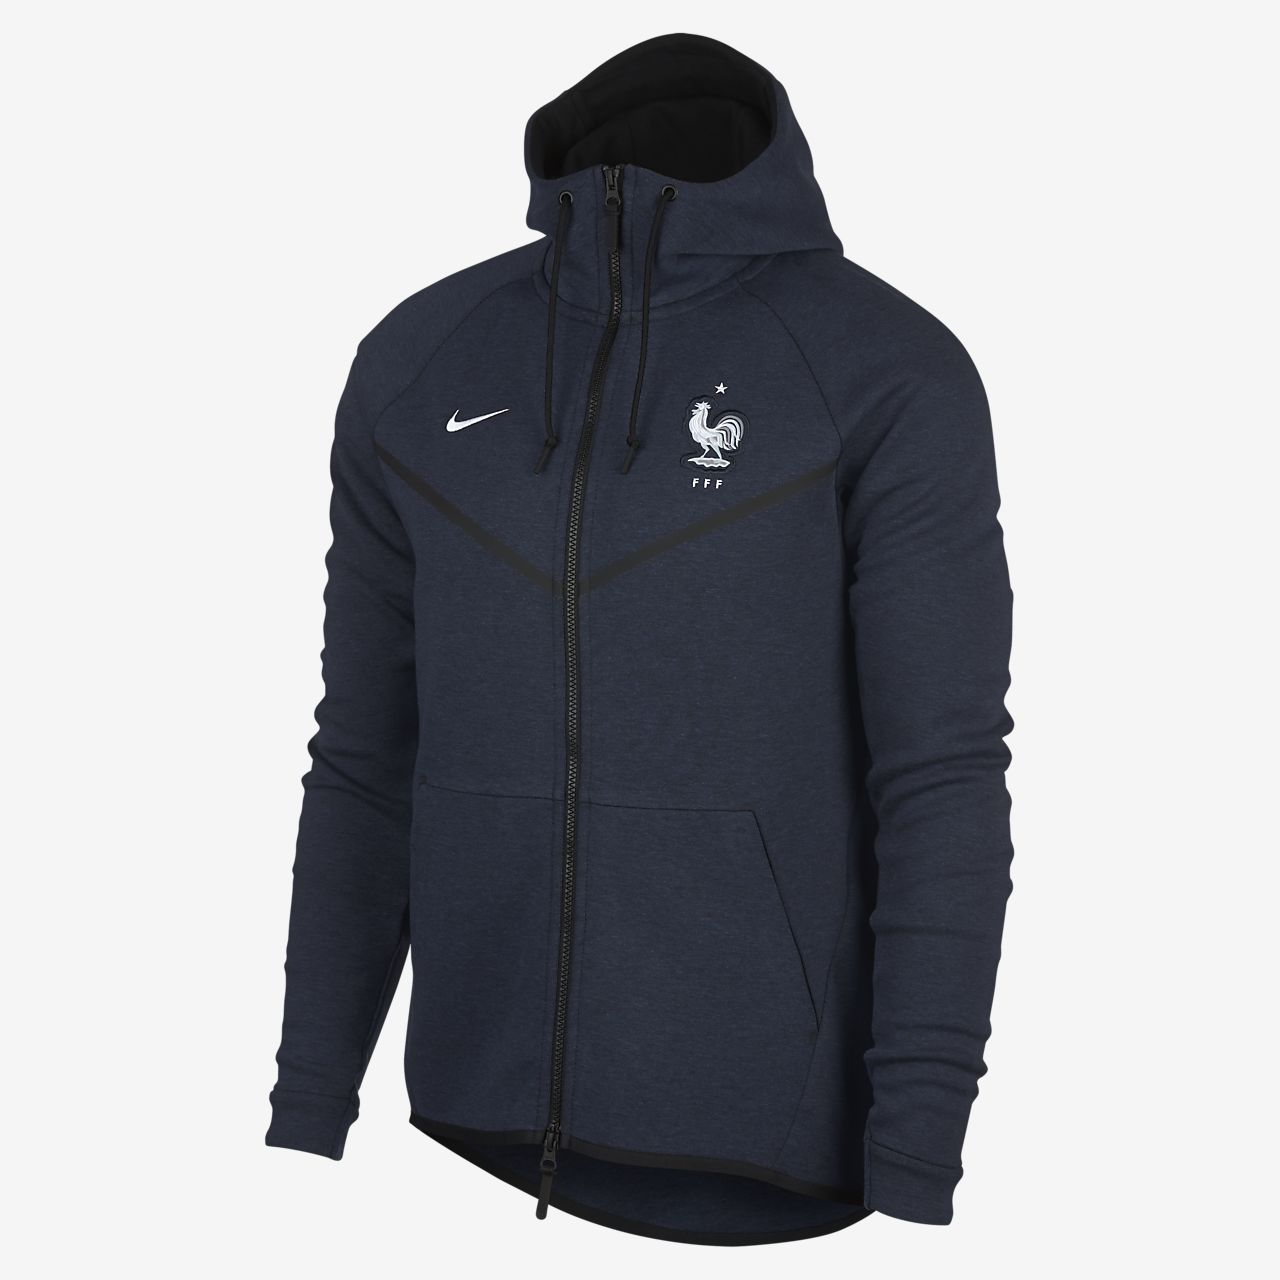 7cef982ca6 FFF Tech Fleece Windrunner Men's Jacket